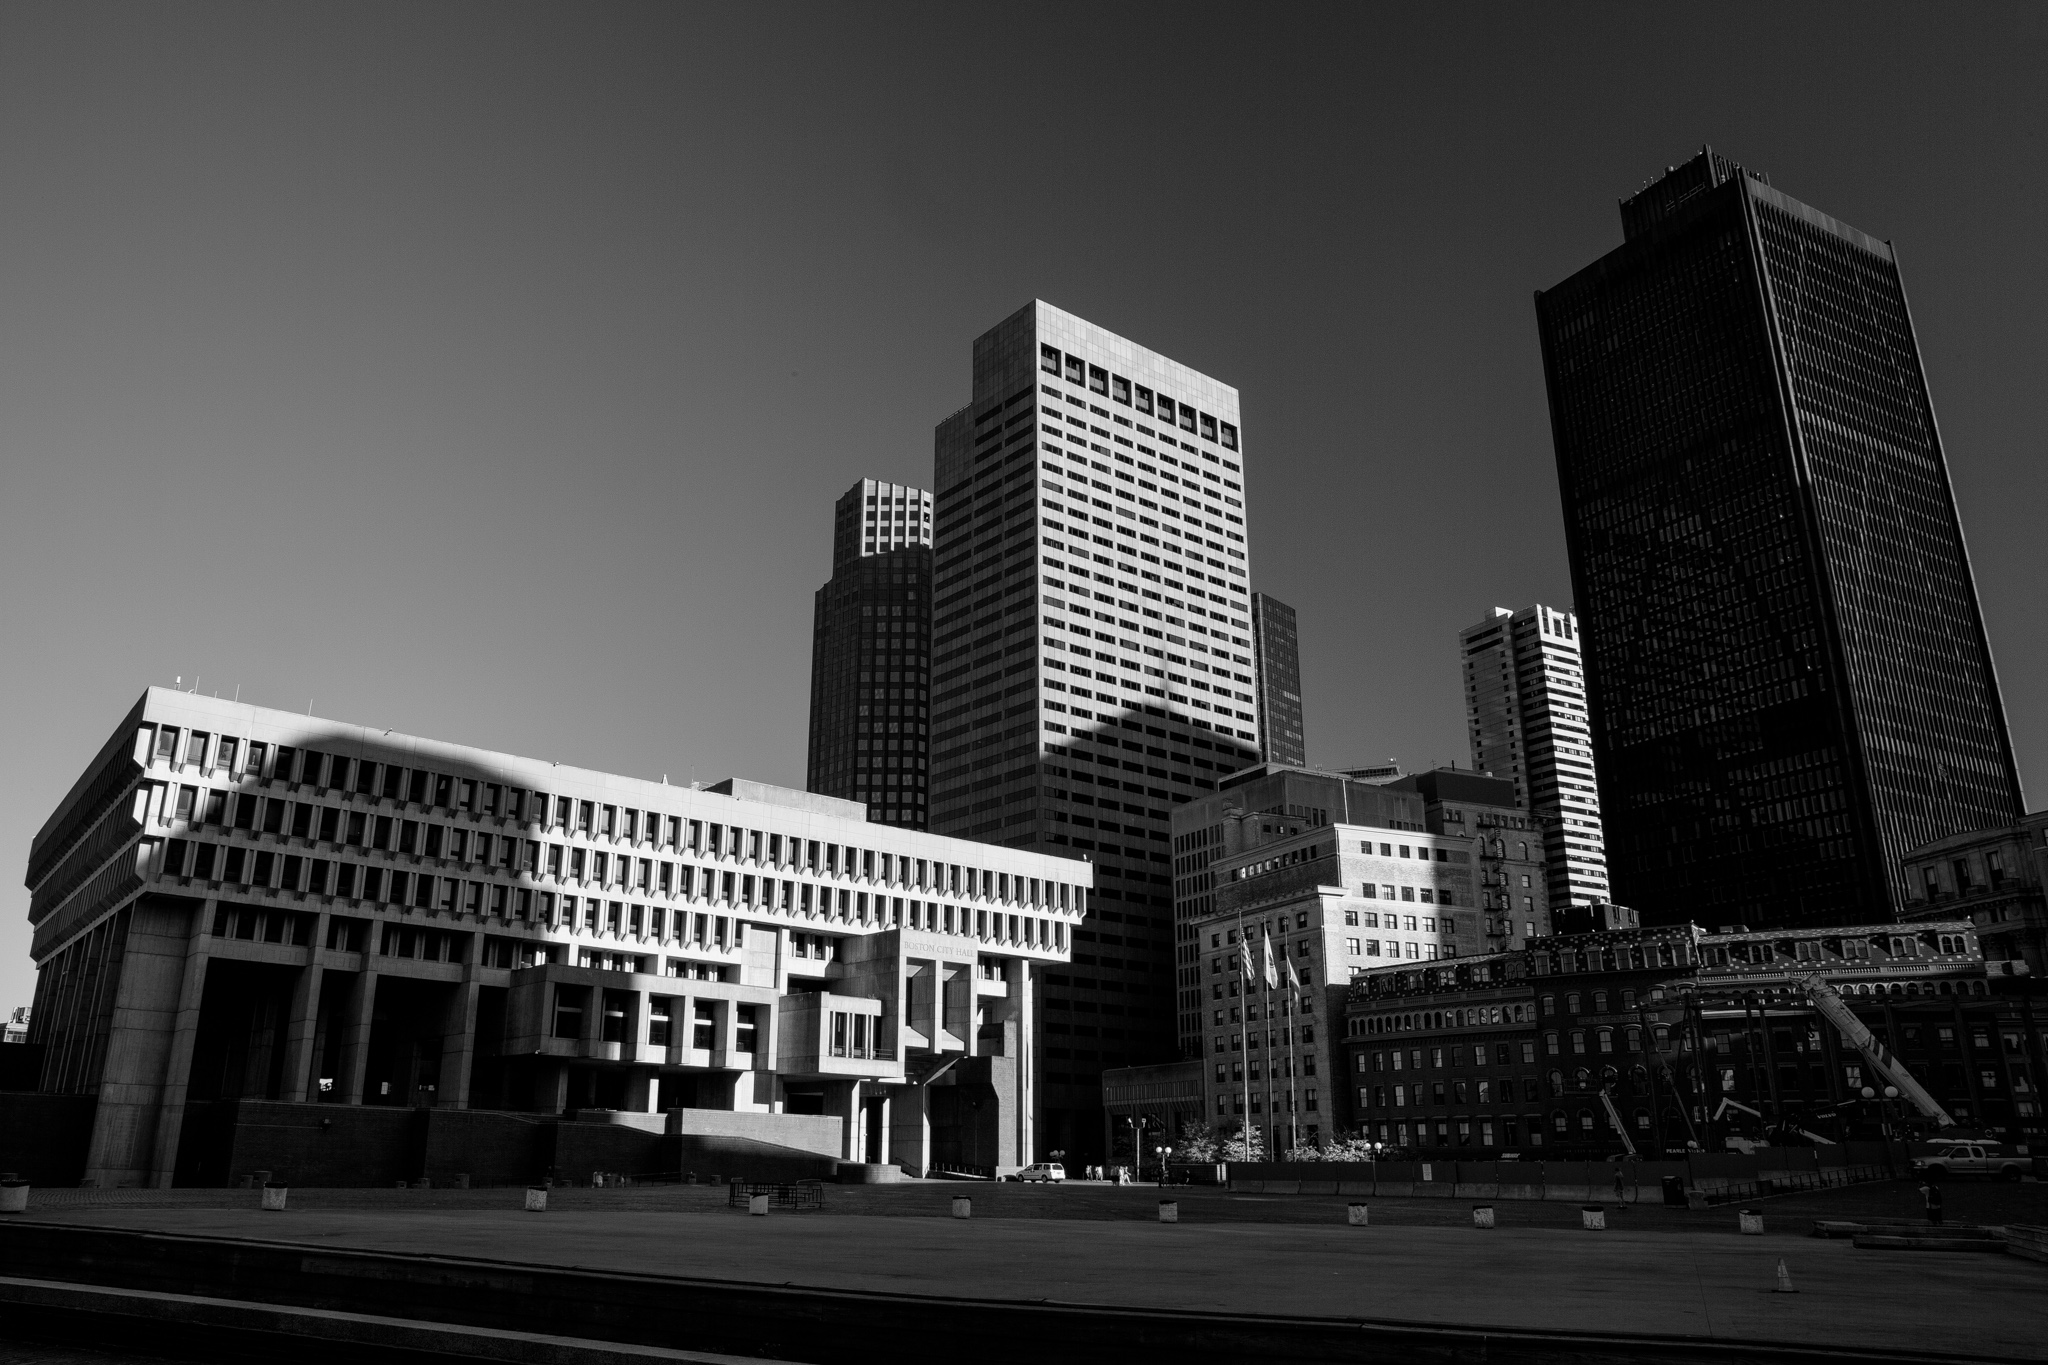 boston-architecture-us_ma_bos-0867-9_city-hall-plaza.jpg